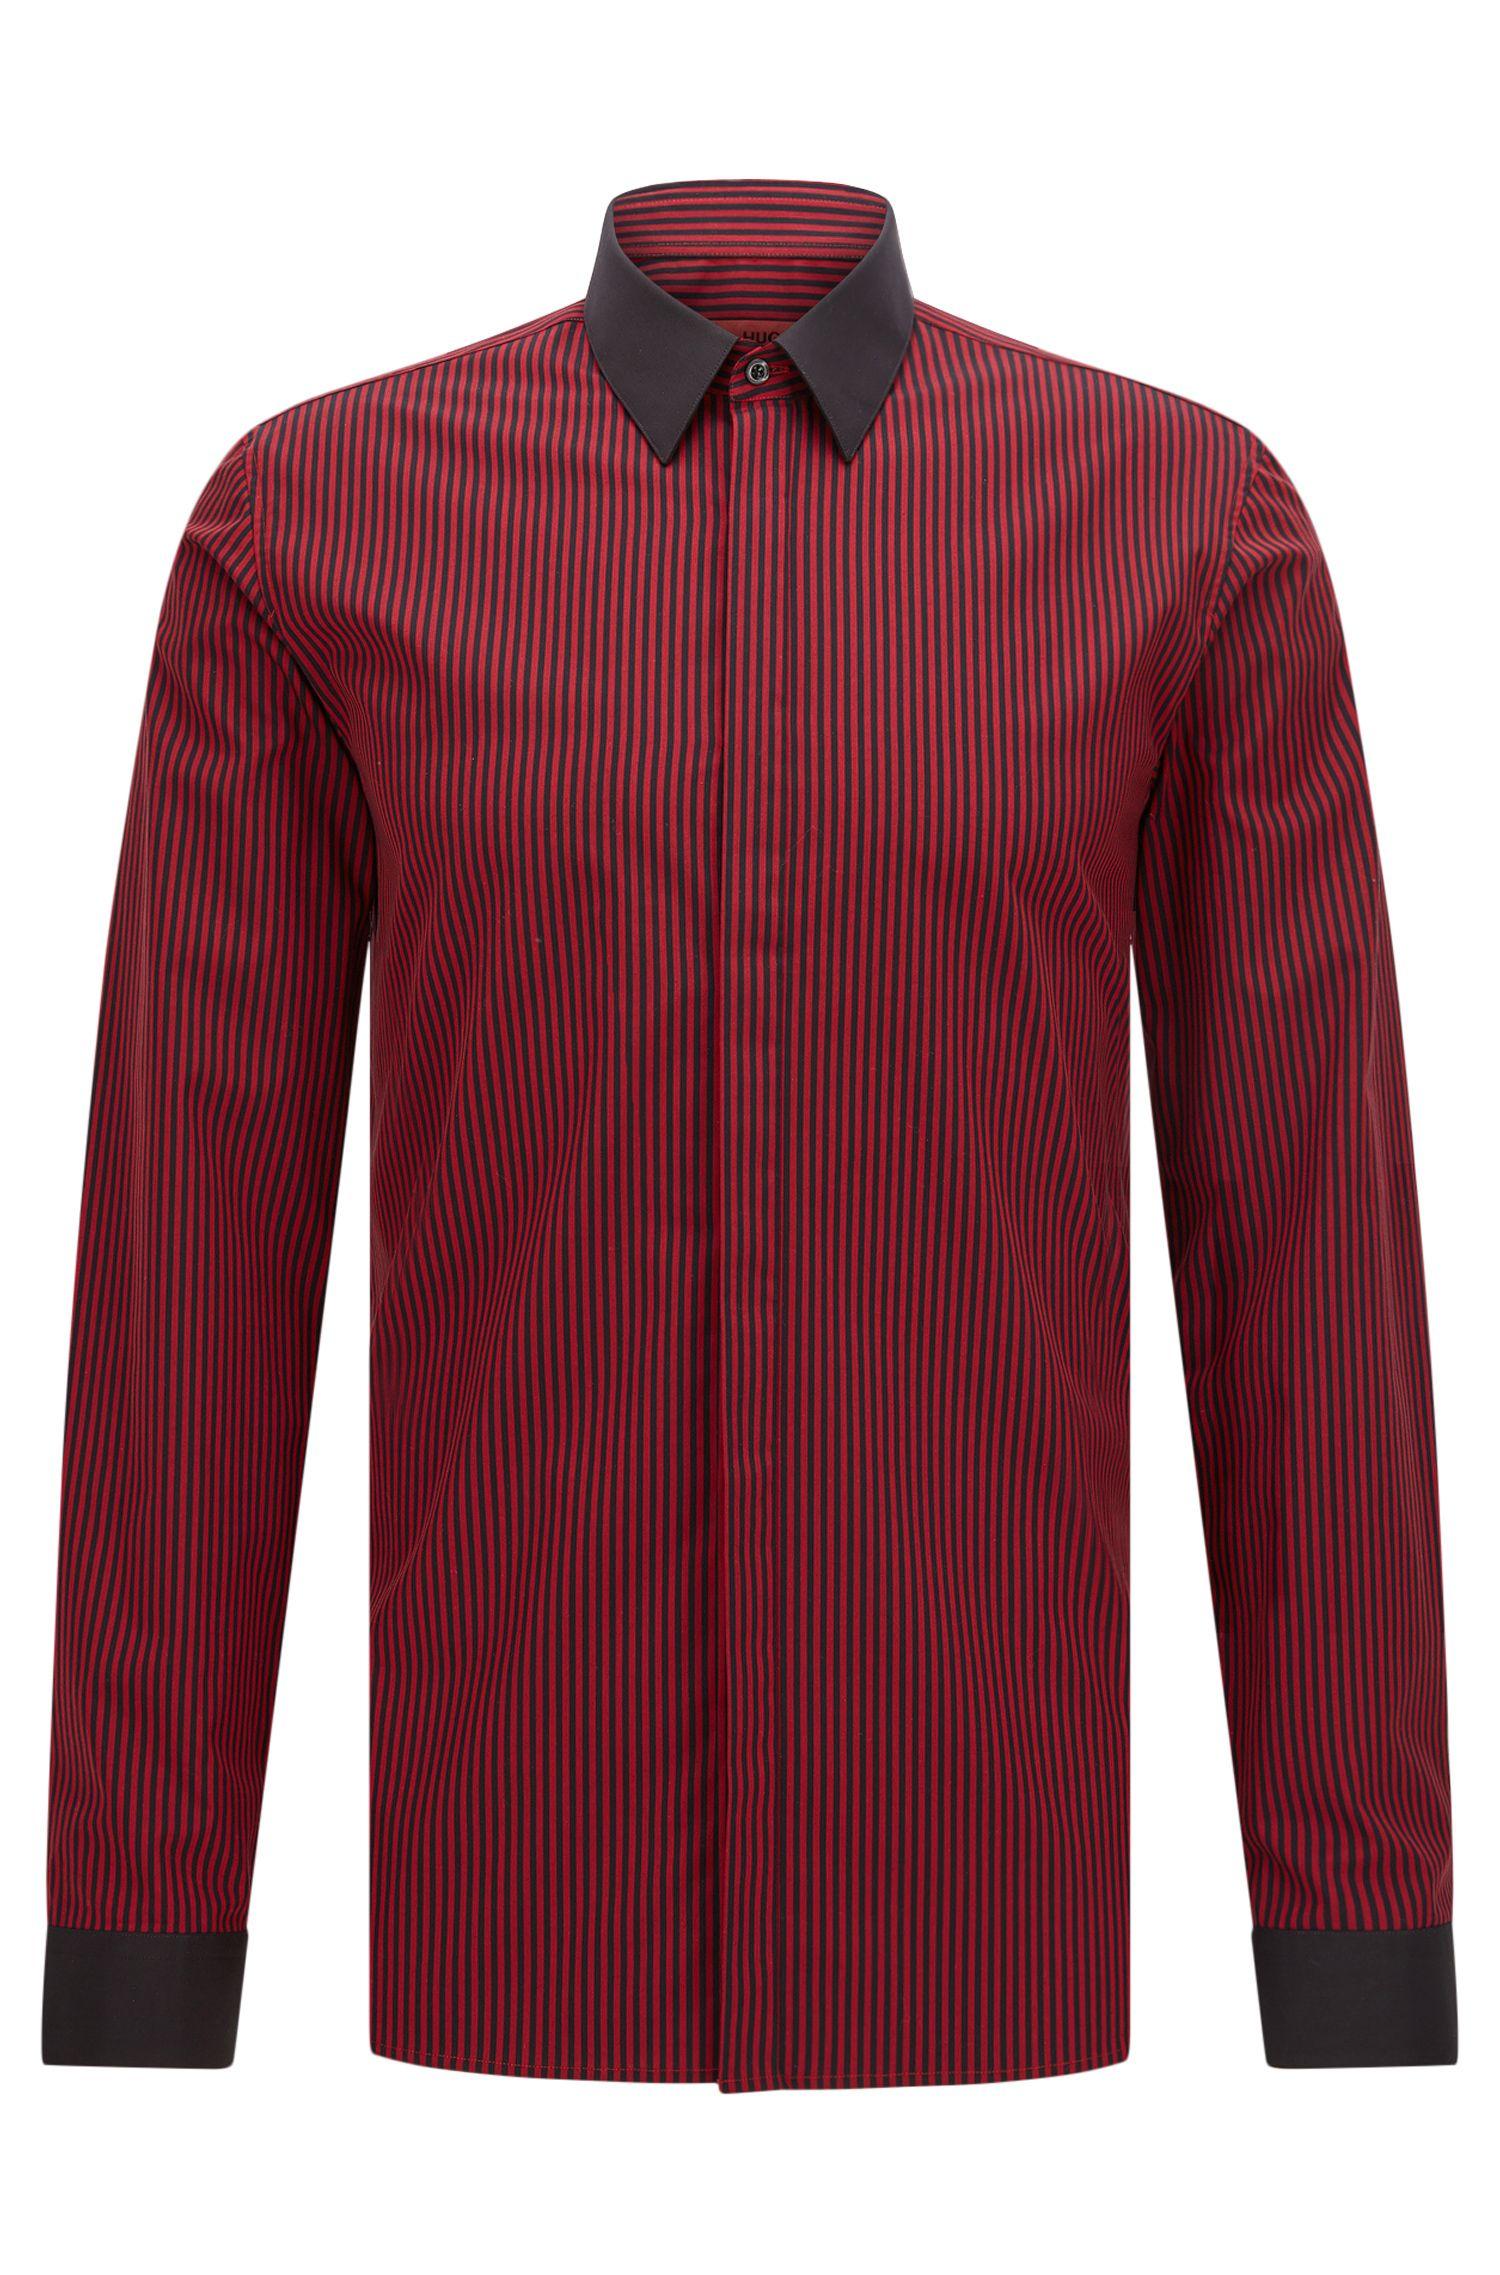 Striped Easy Iron Cotton Dress Shirt, Extra Slim Fit   Elynon